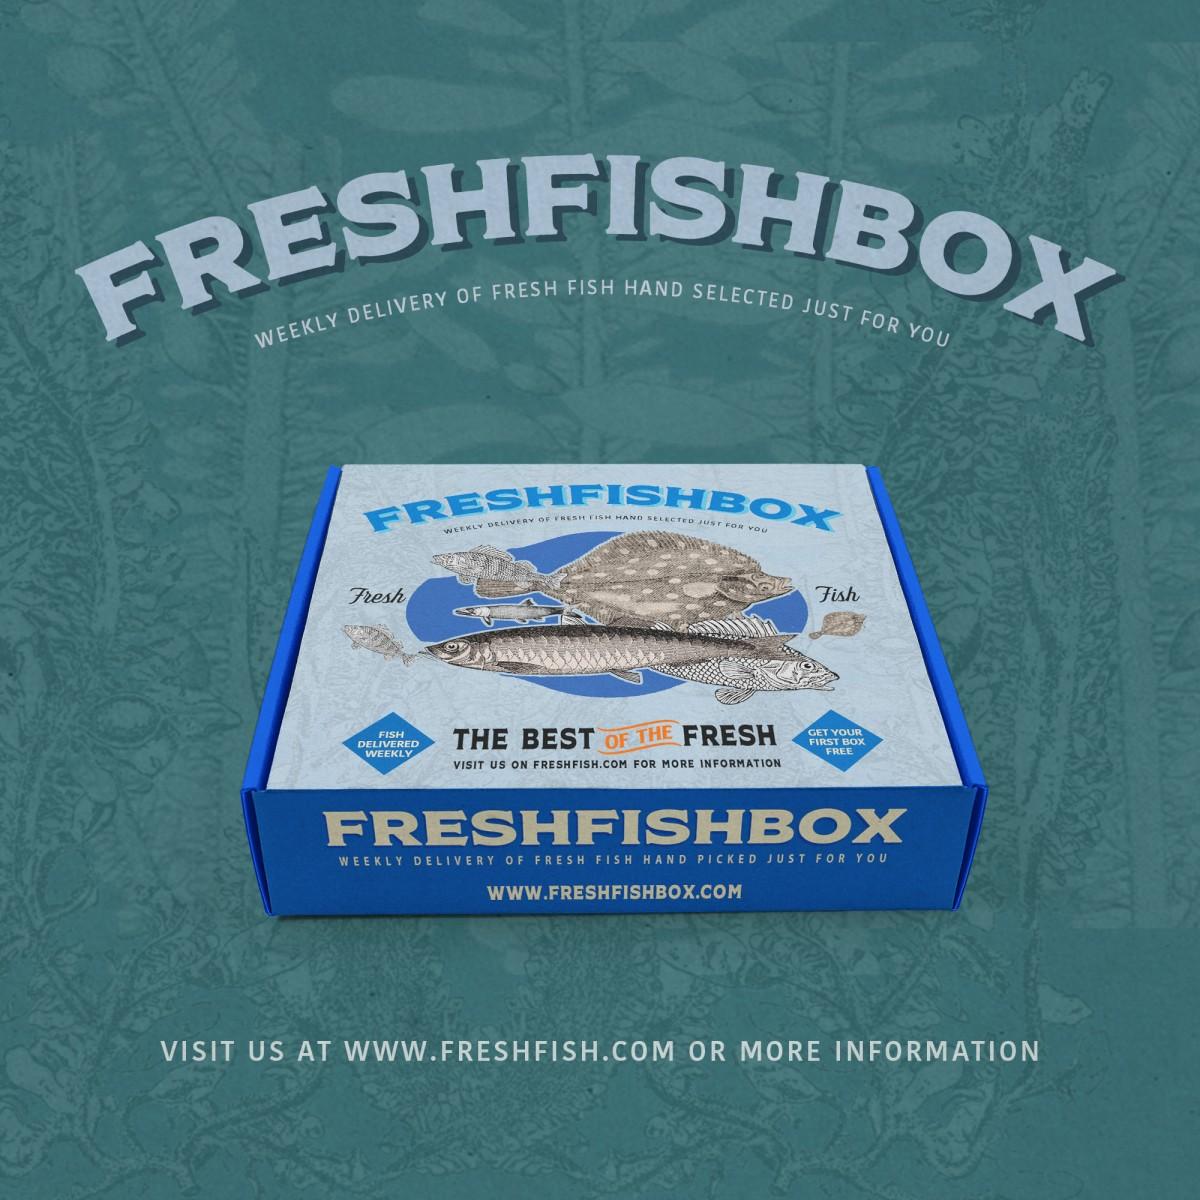 FreshFish Box